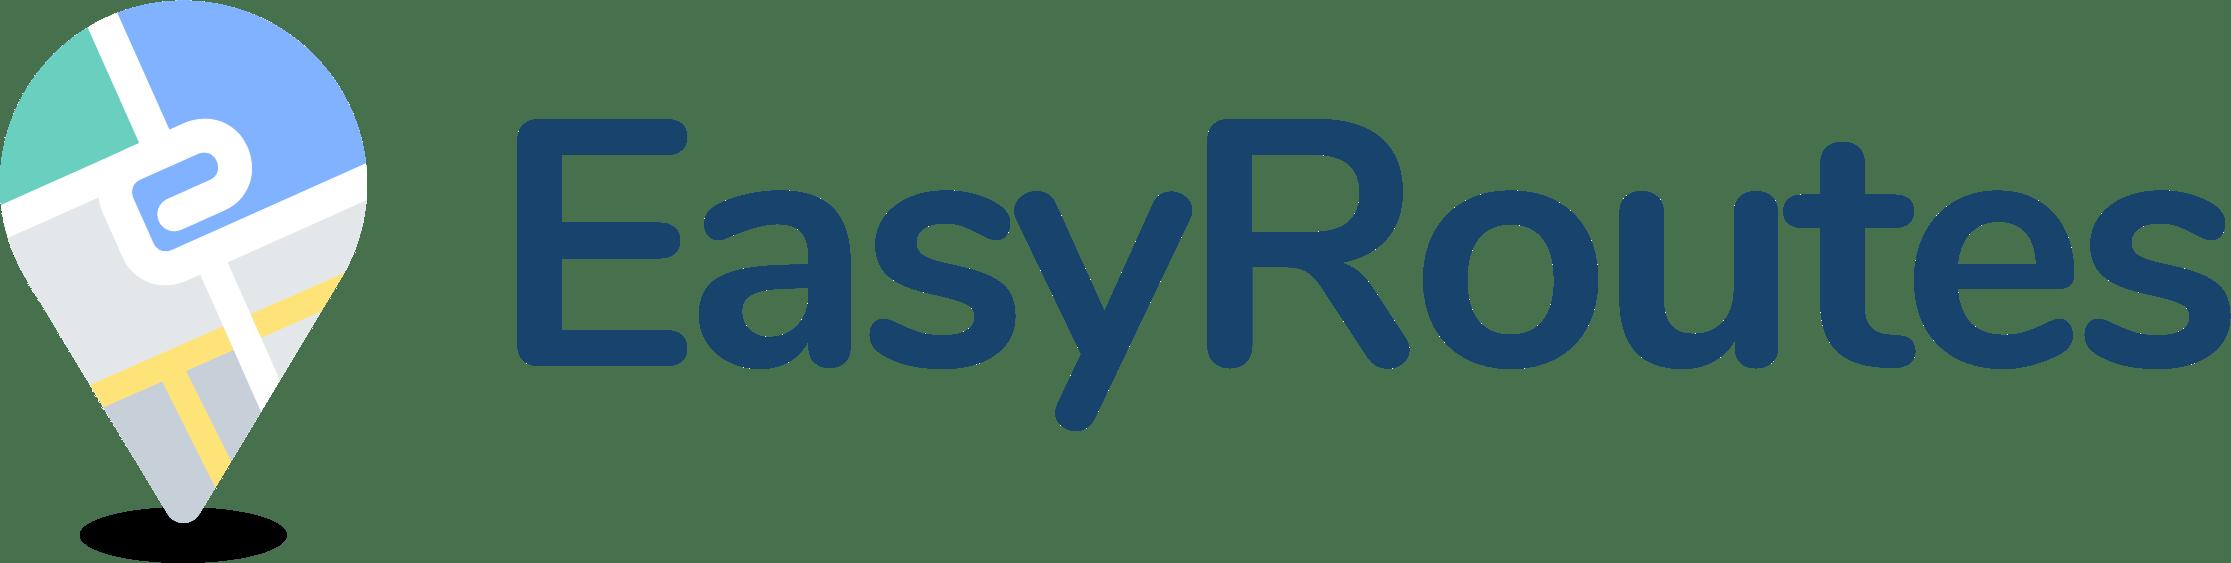 EasyRoutes Blog